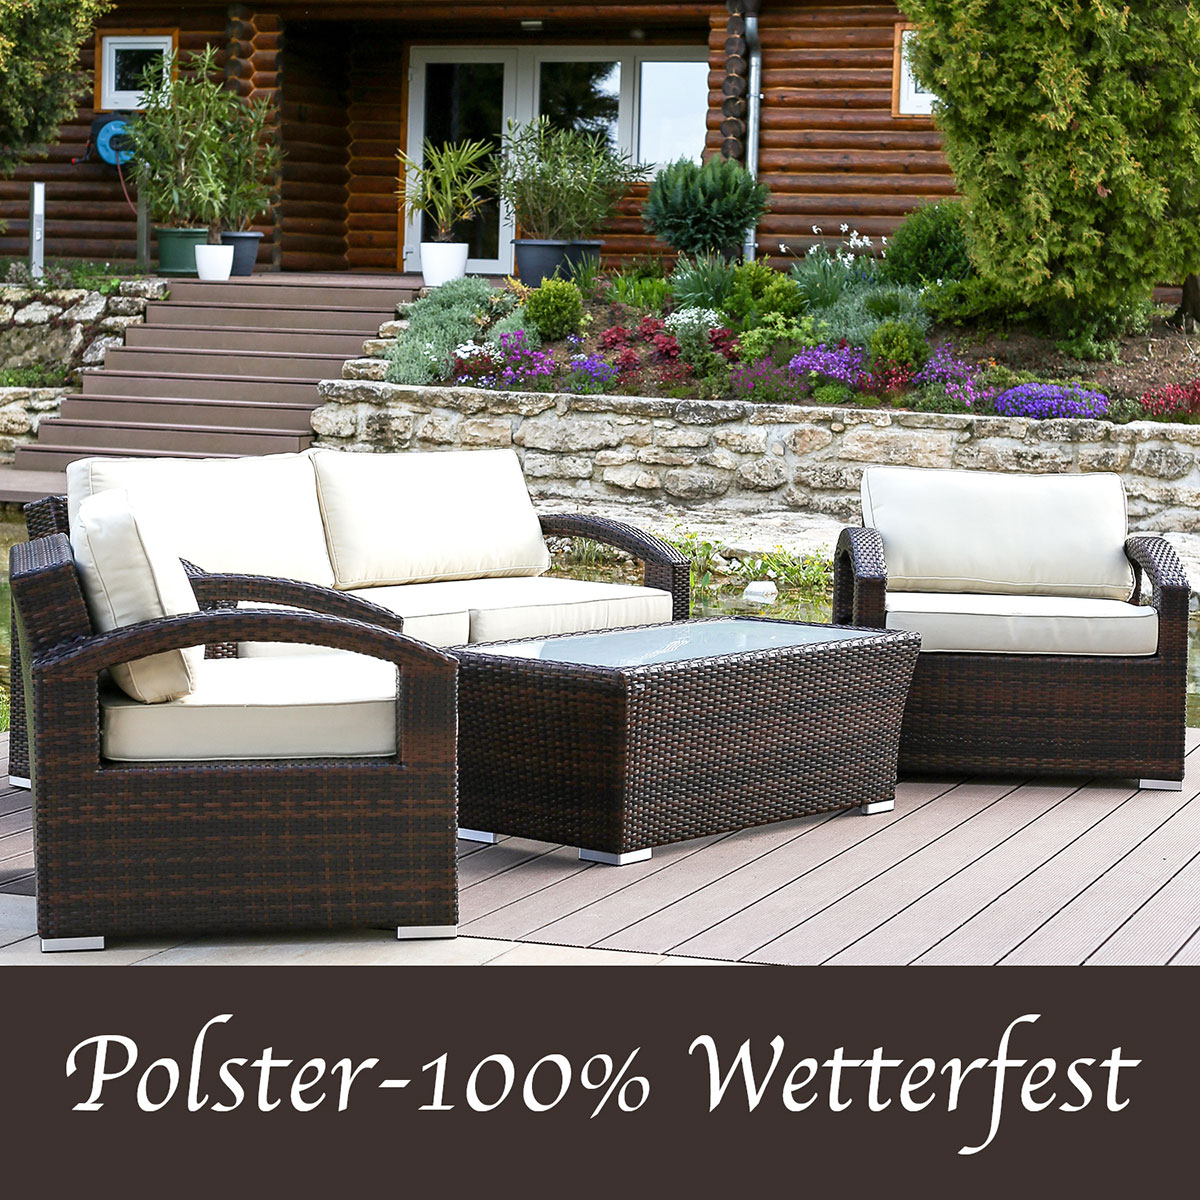 polyrattan gartenmöbel lounge - lounge möbel, lounge set, Gartenmöbel